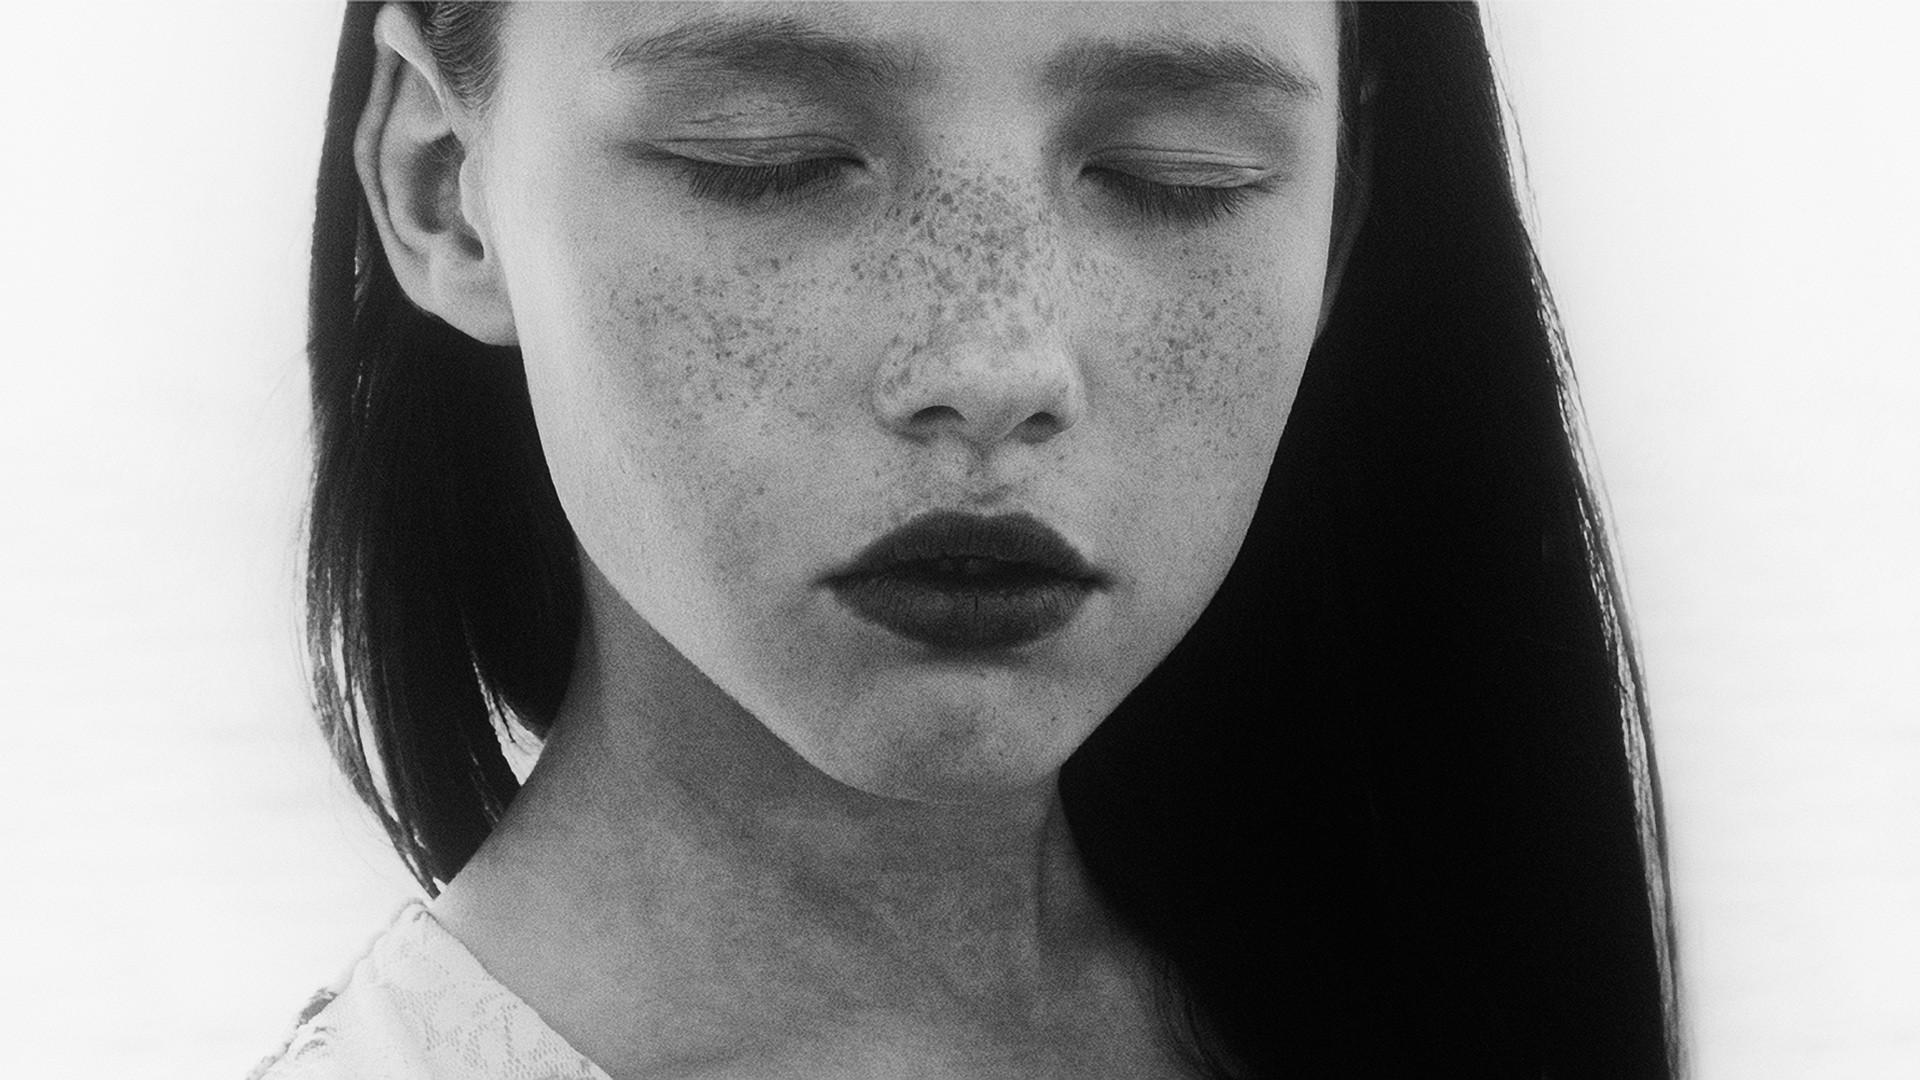 Freckles Brunette Face Closed Eyes Closeup 1920x1080